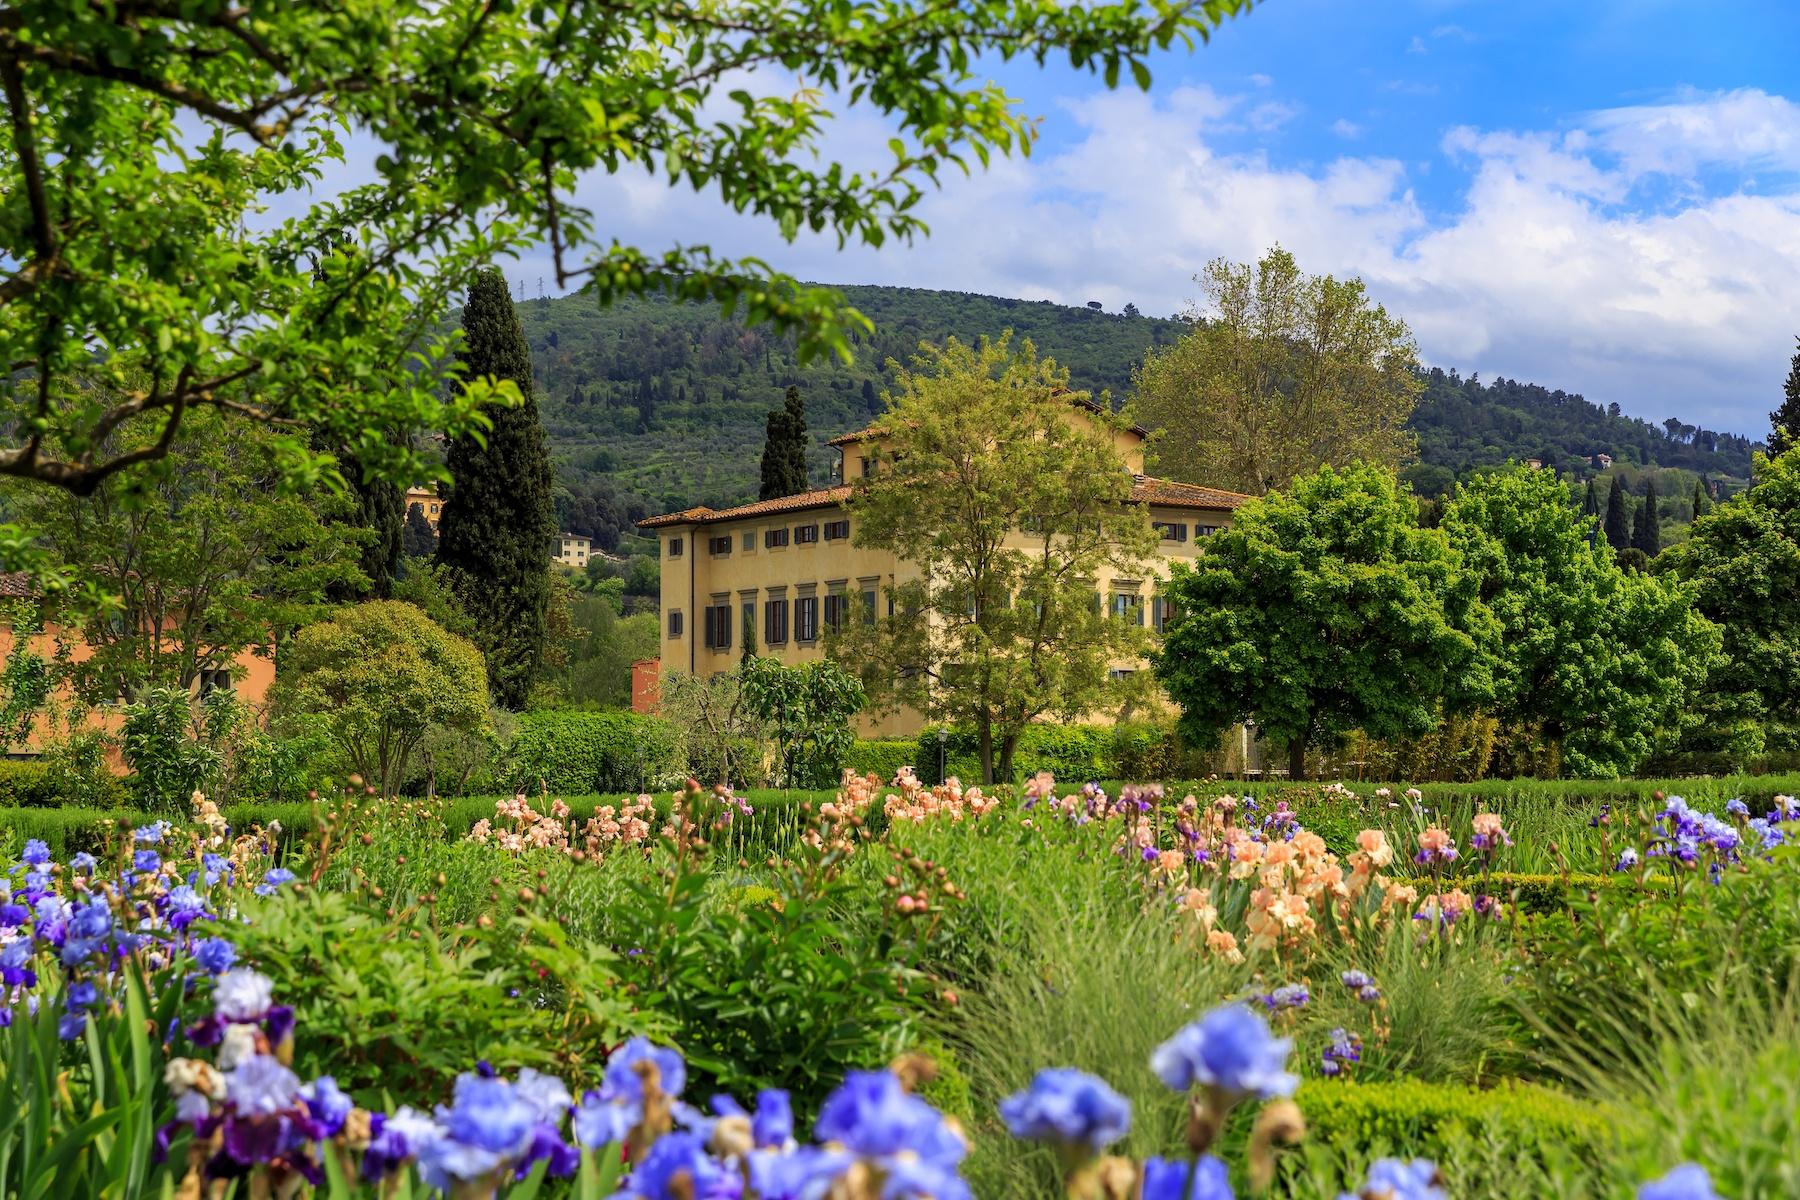 Iris Garden   Noble Villa on the background - Villa La Massa, Florenz